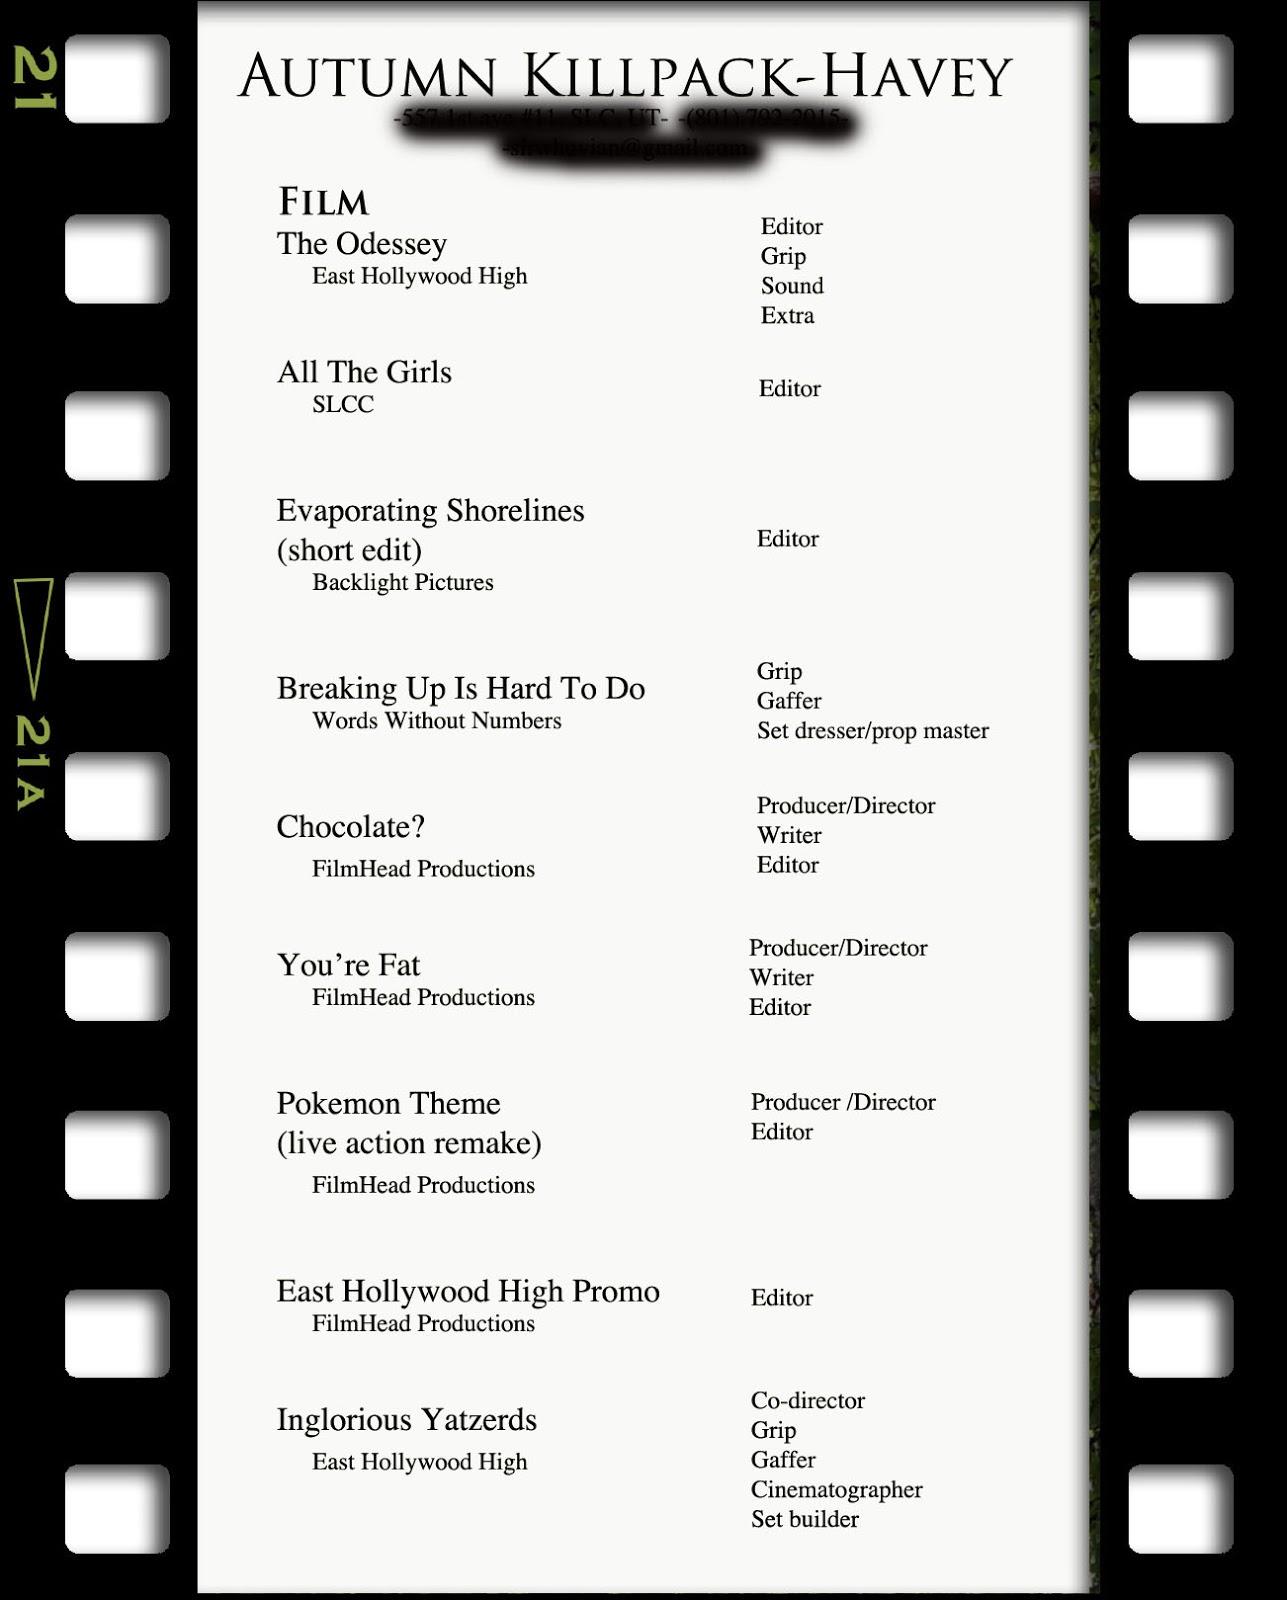 Resume For Film Internship